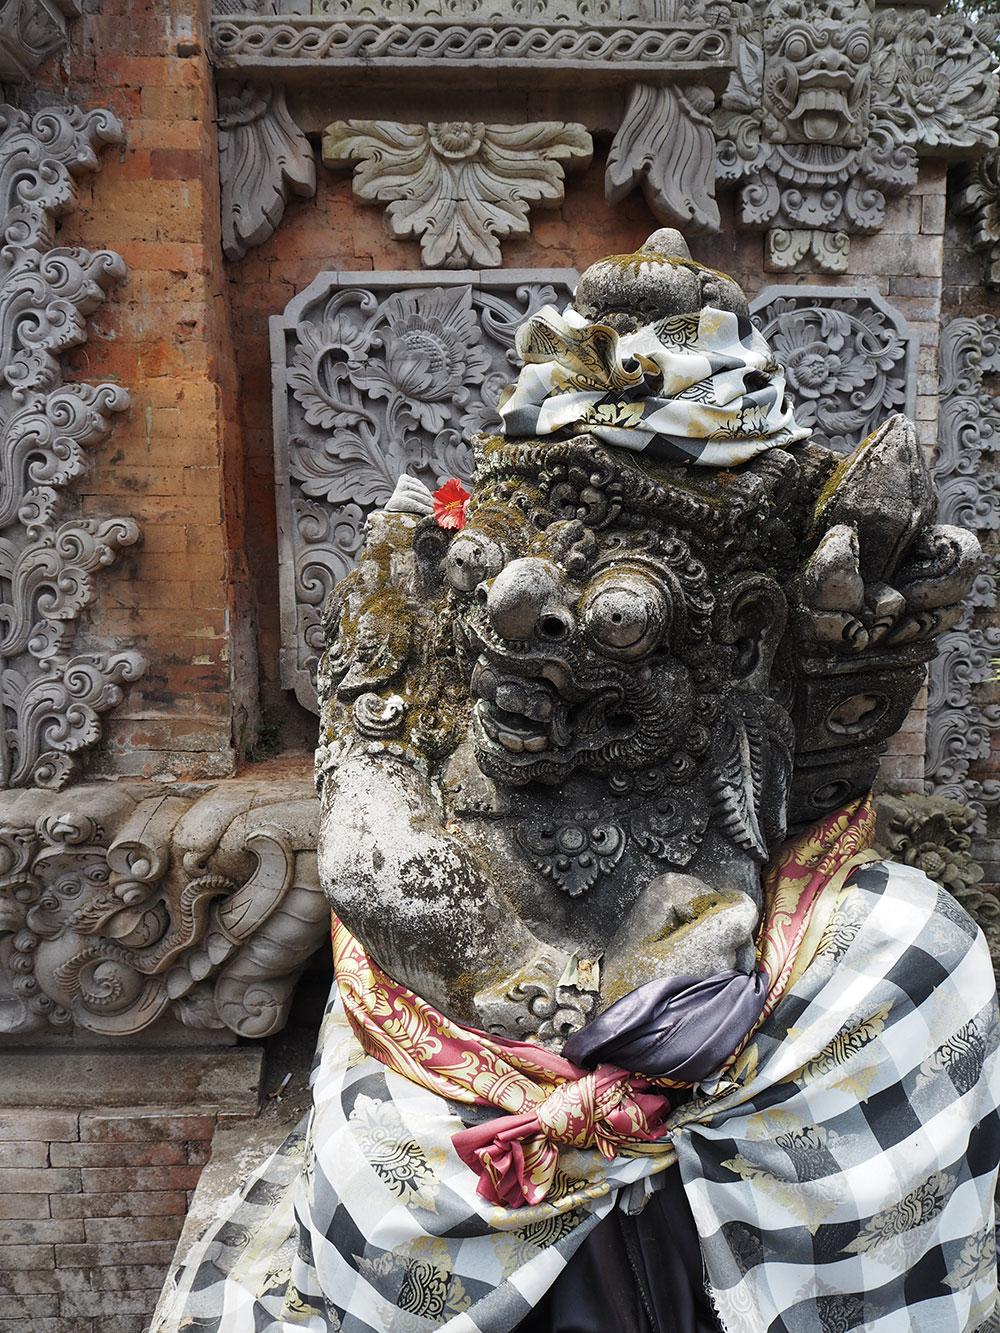 RosyCheeks-Bali-Ubud-Temple-figure